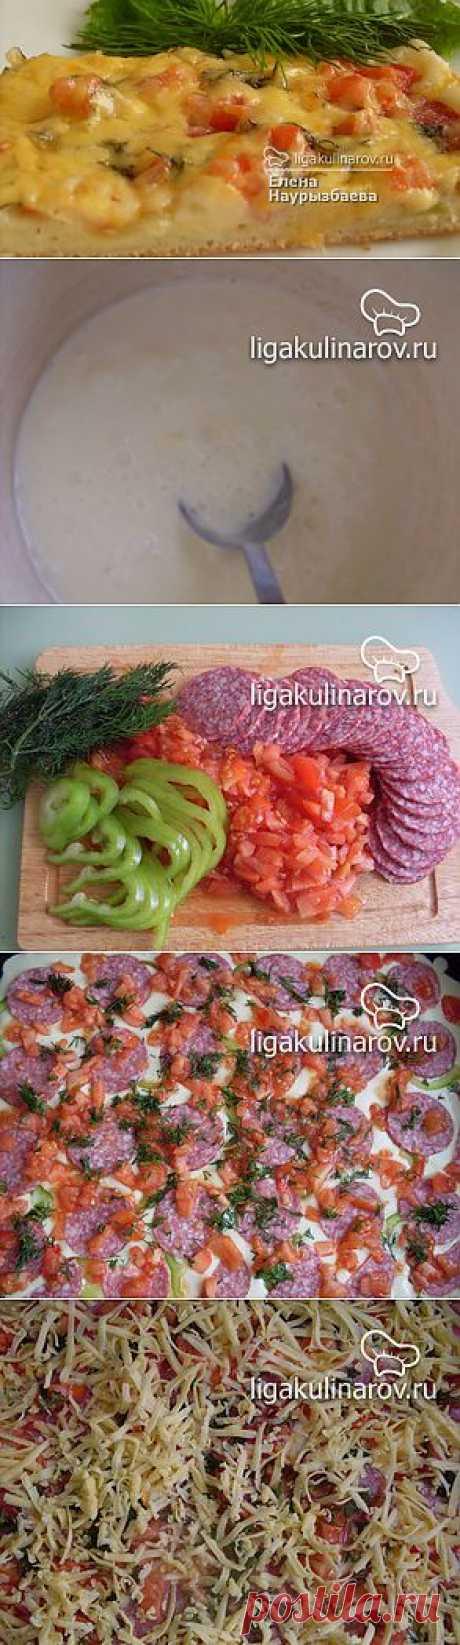 Пицца на майонезе – рецепт с фото от Лиги Кулинаров, пошаговый рецепт